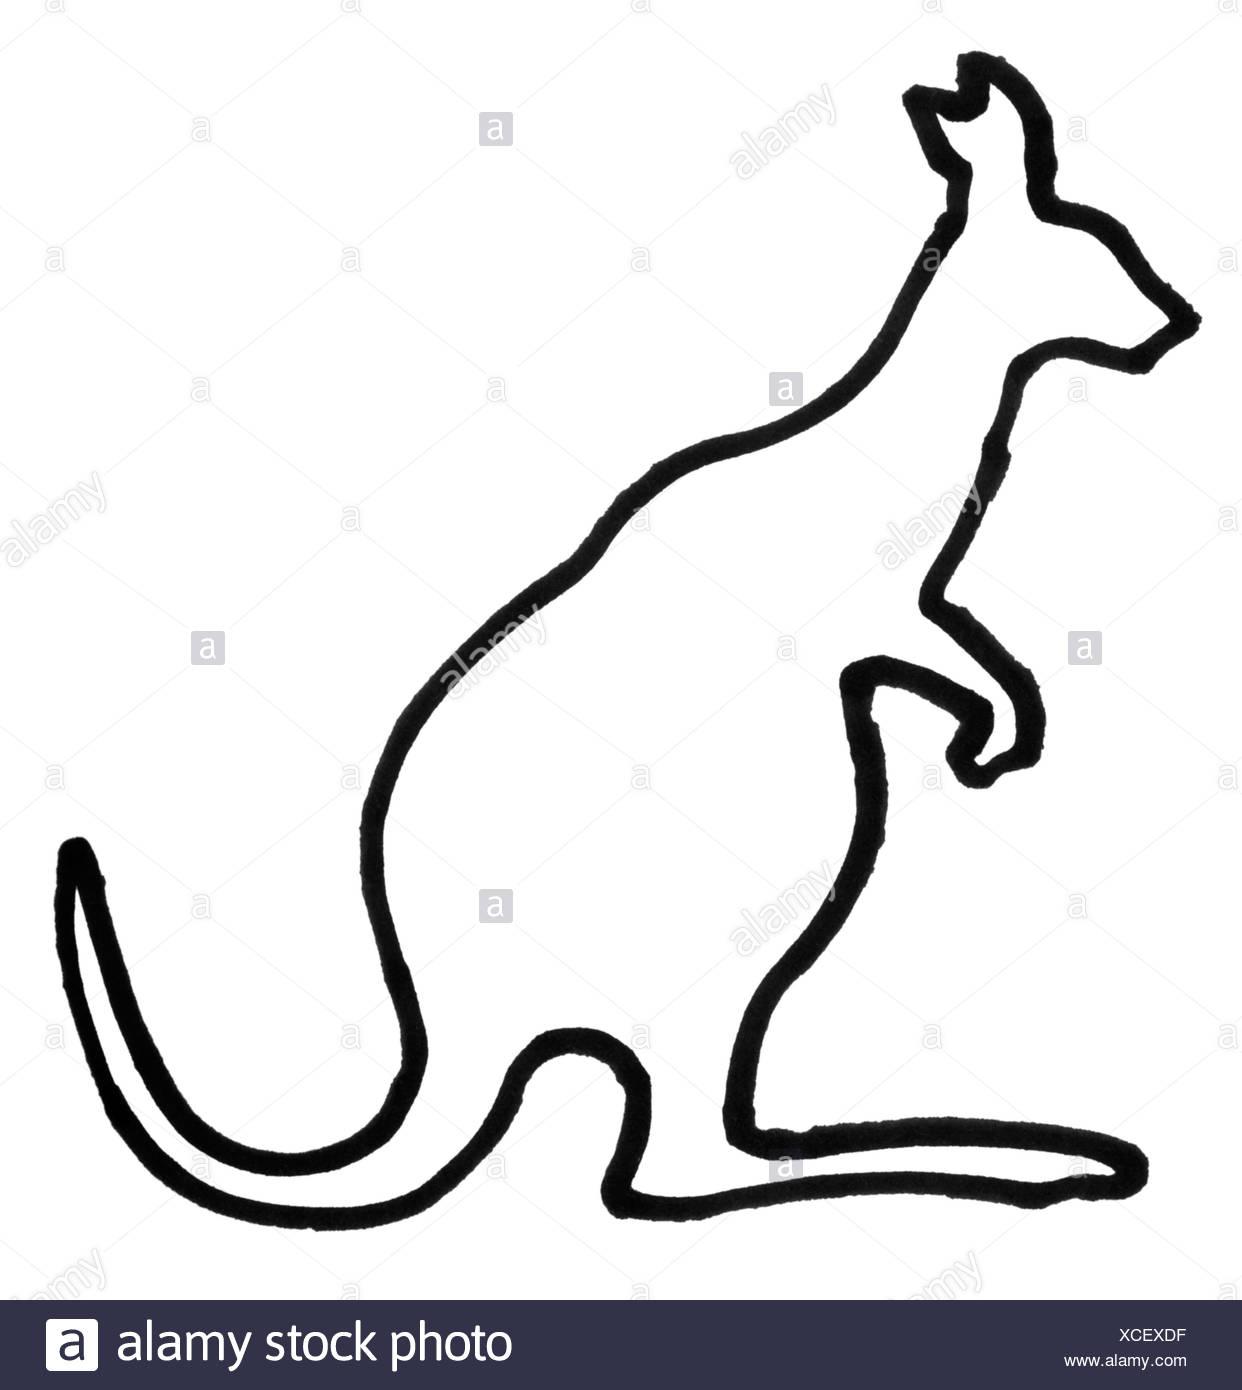 Outline Of A Kangaroo Stock Photo  283069851